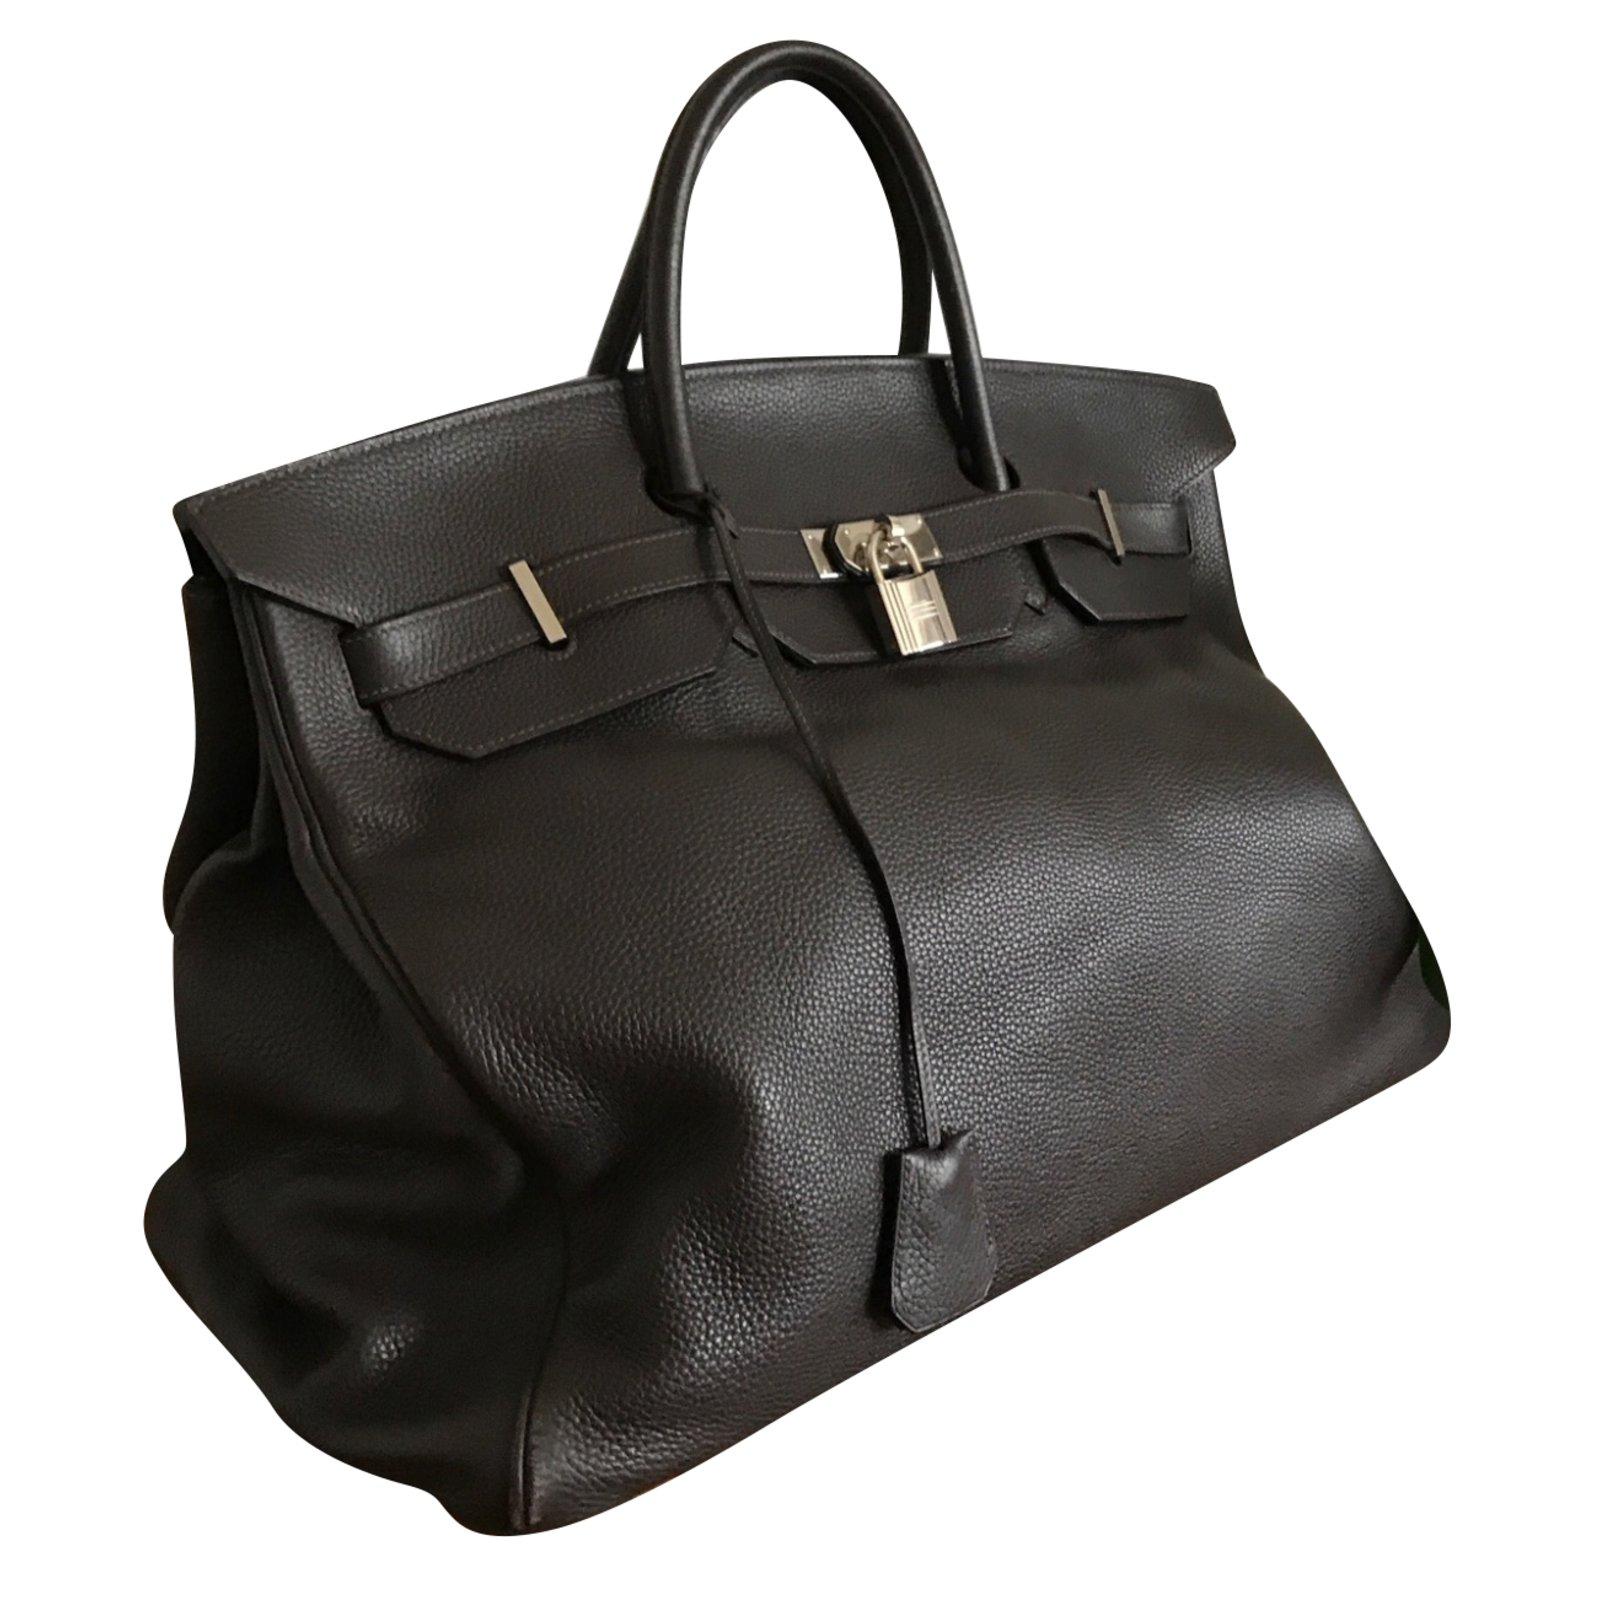 9969b541b37 Hermès Birkin bag 48 hours(Week-end) Travel bag Leather Dark brown  ref.89654 - Joli Closet